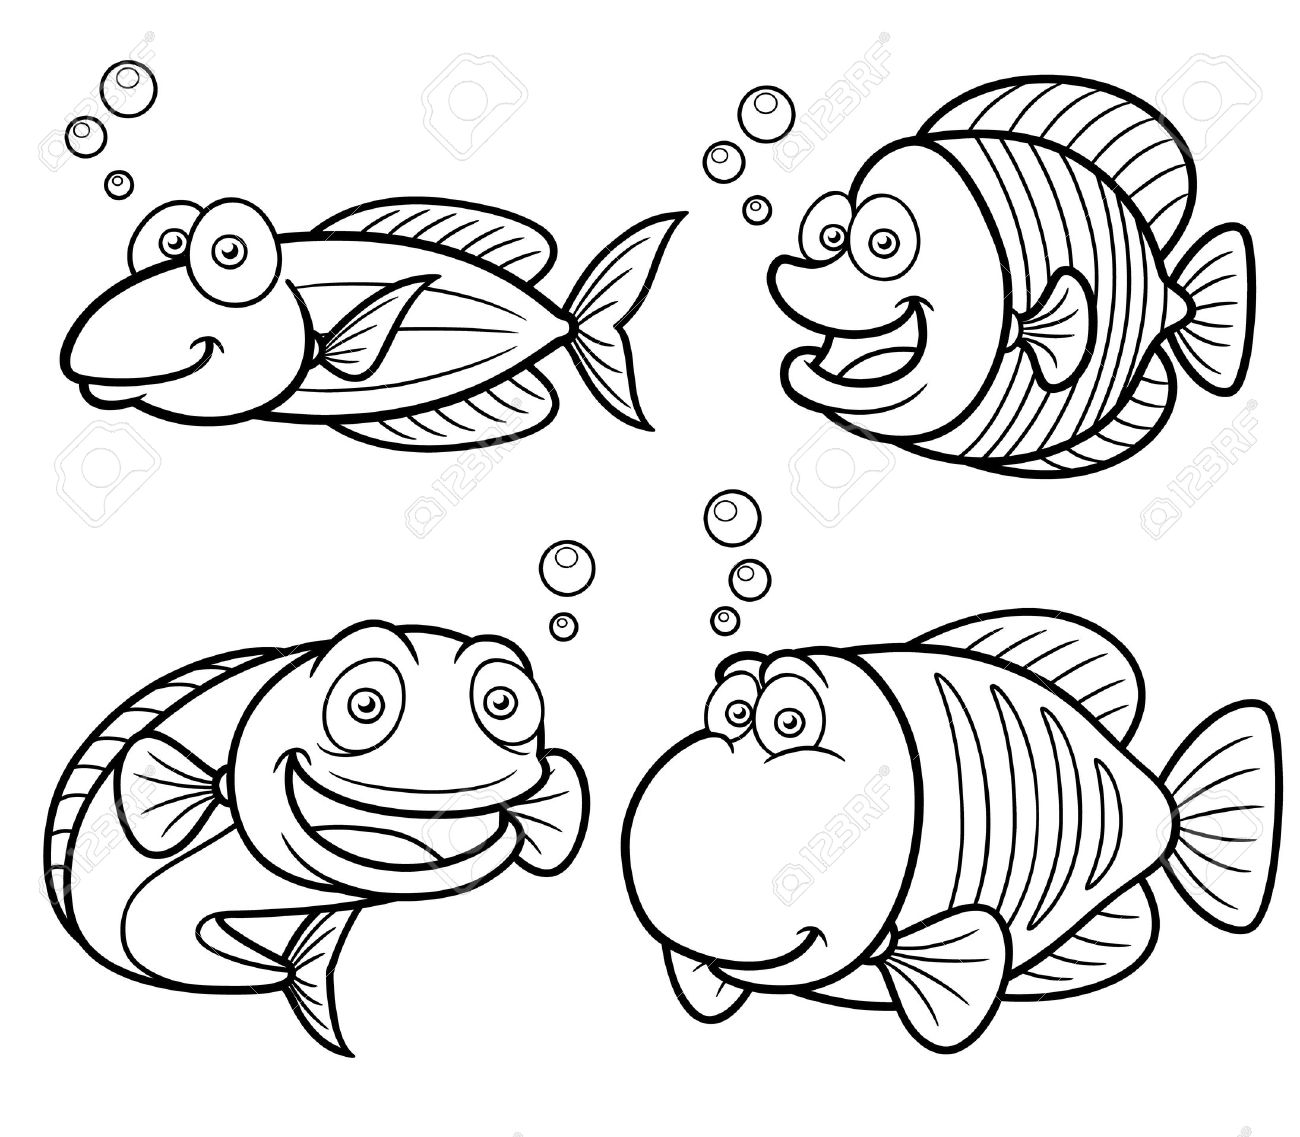 Illustration Of Sea Fish Set - Coloring Book Royalty Free Cliparts ...